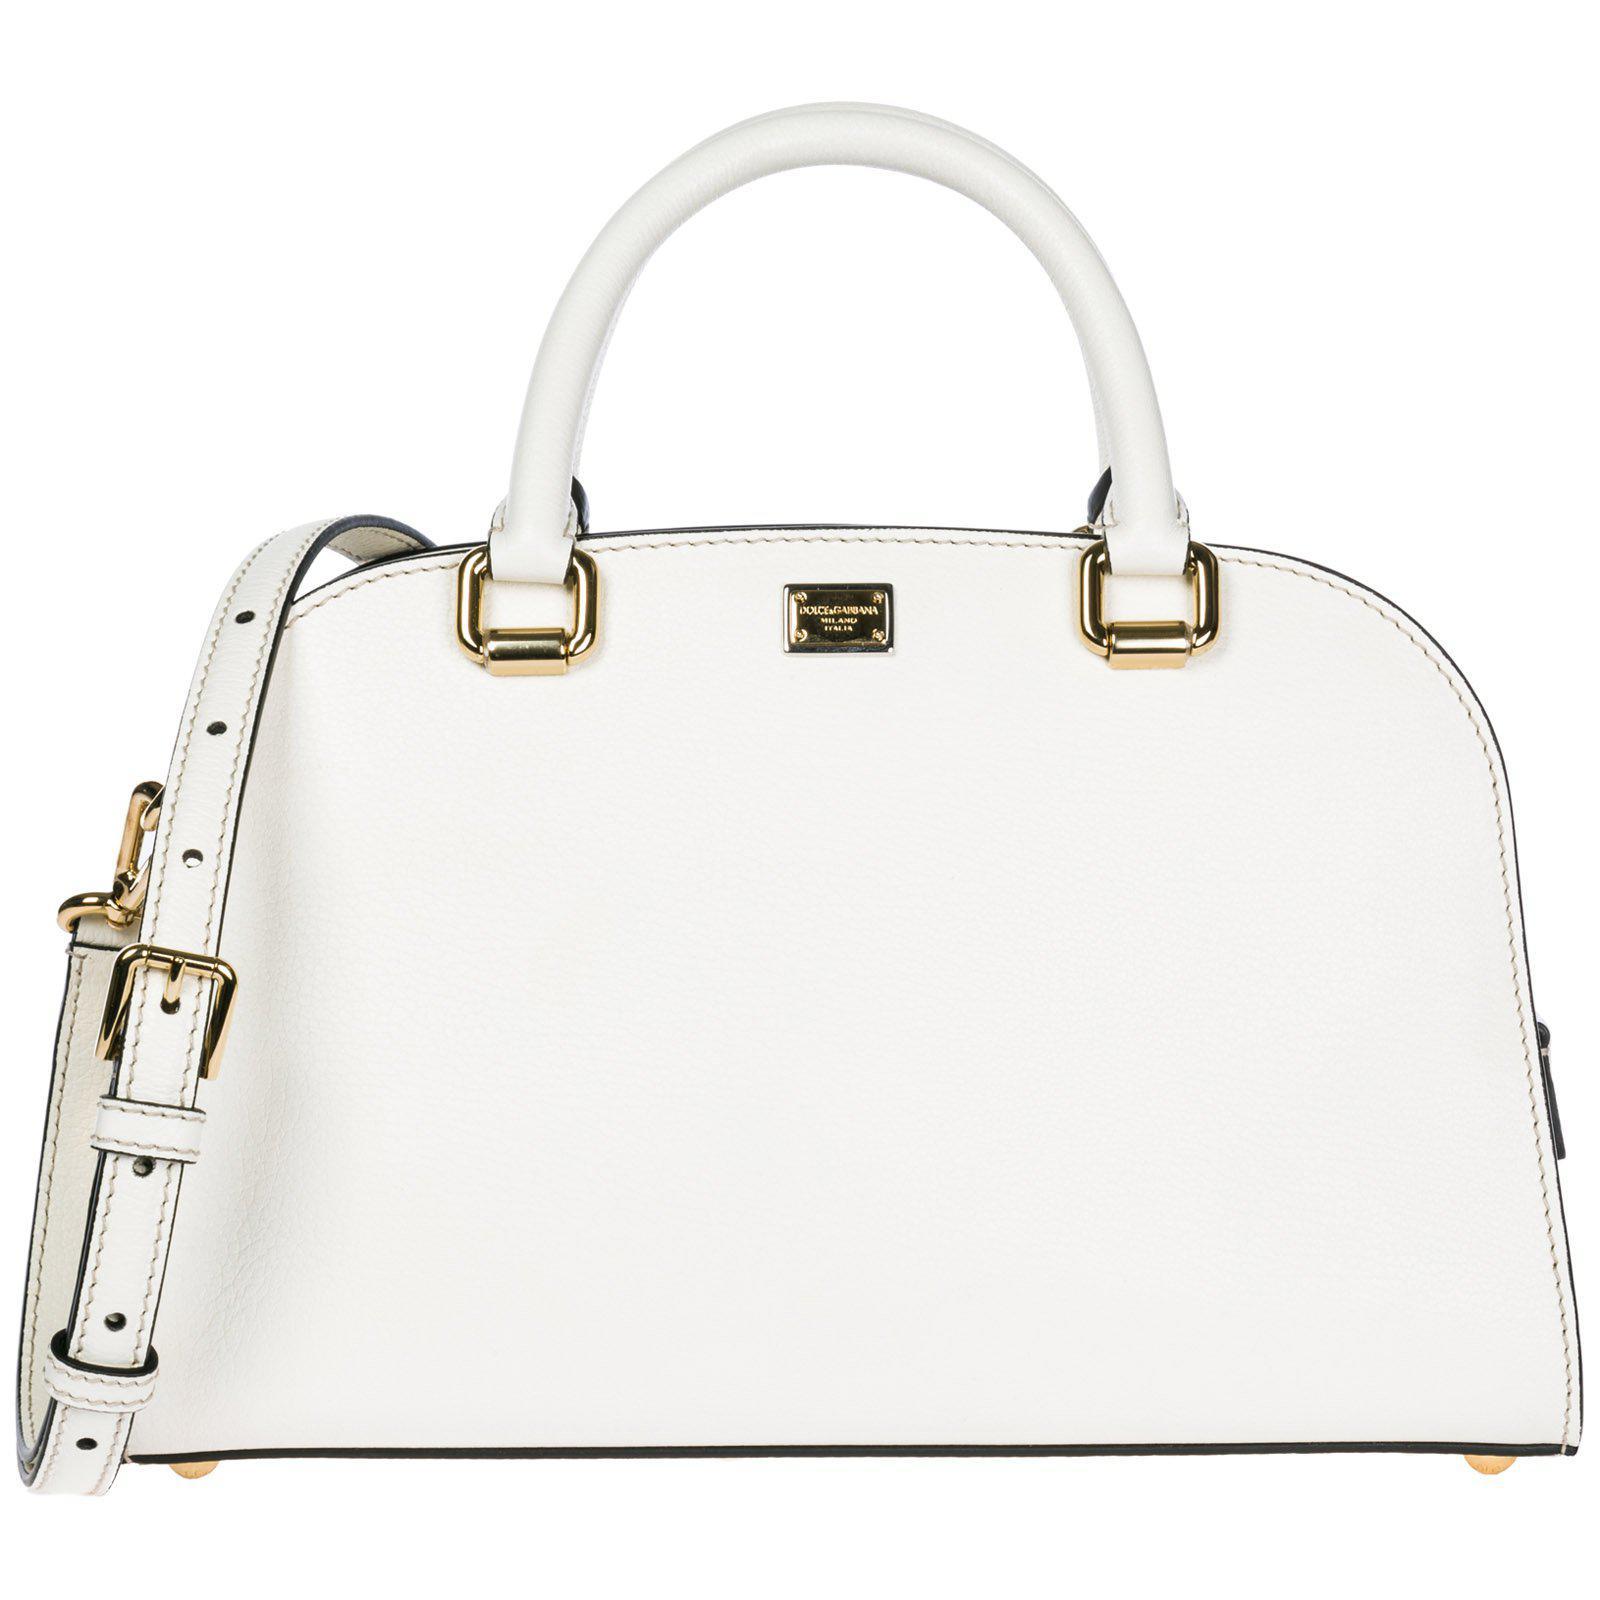 101e1ed2ac0b Lyst - Dolce   Gabbana Medium Isabella Tote Bag in White